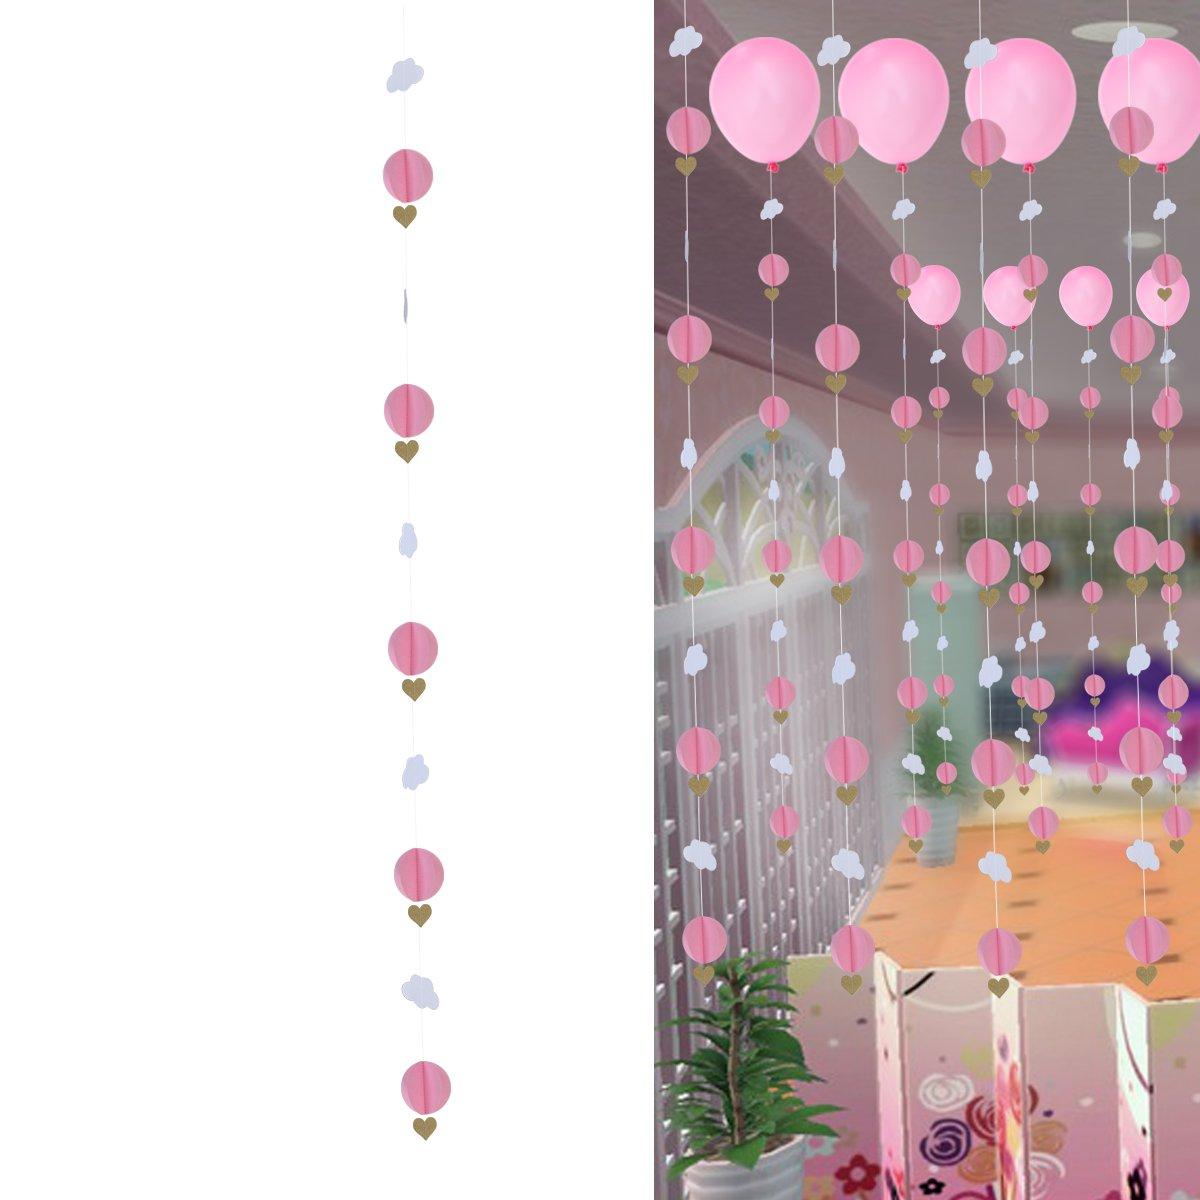 OULII 3dカラフルな雲Love Heartsガーランドハンギングウェディングバレンタインの日の装飾ベビールーム保育園装飾誕生日パーティーFavors (ピンク) B077Z78TNF